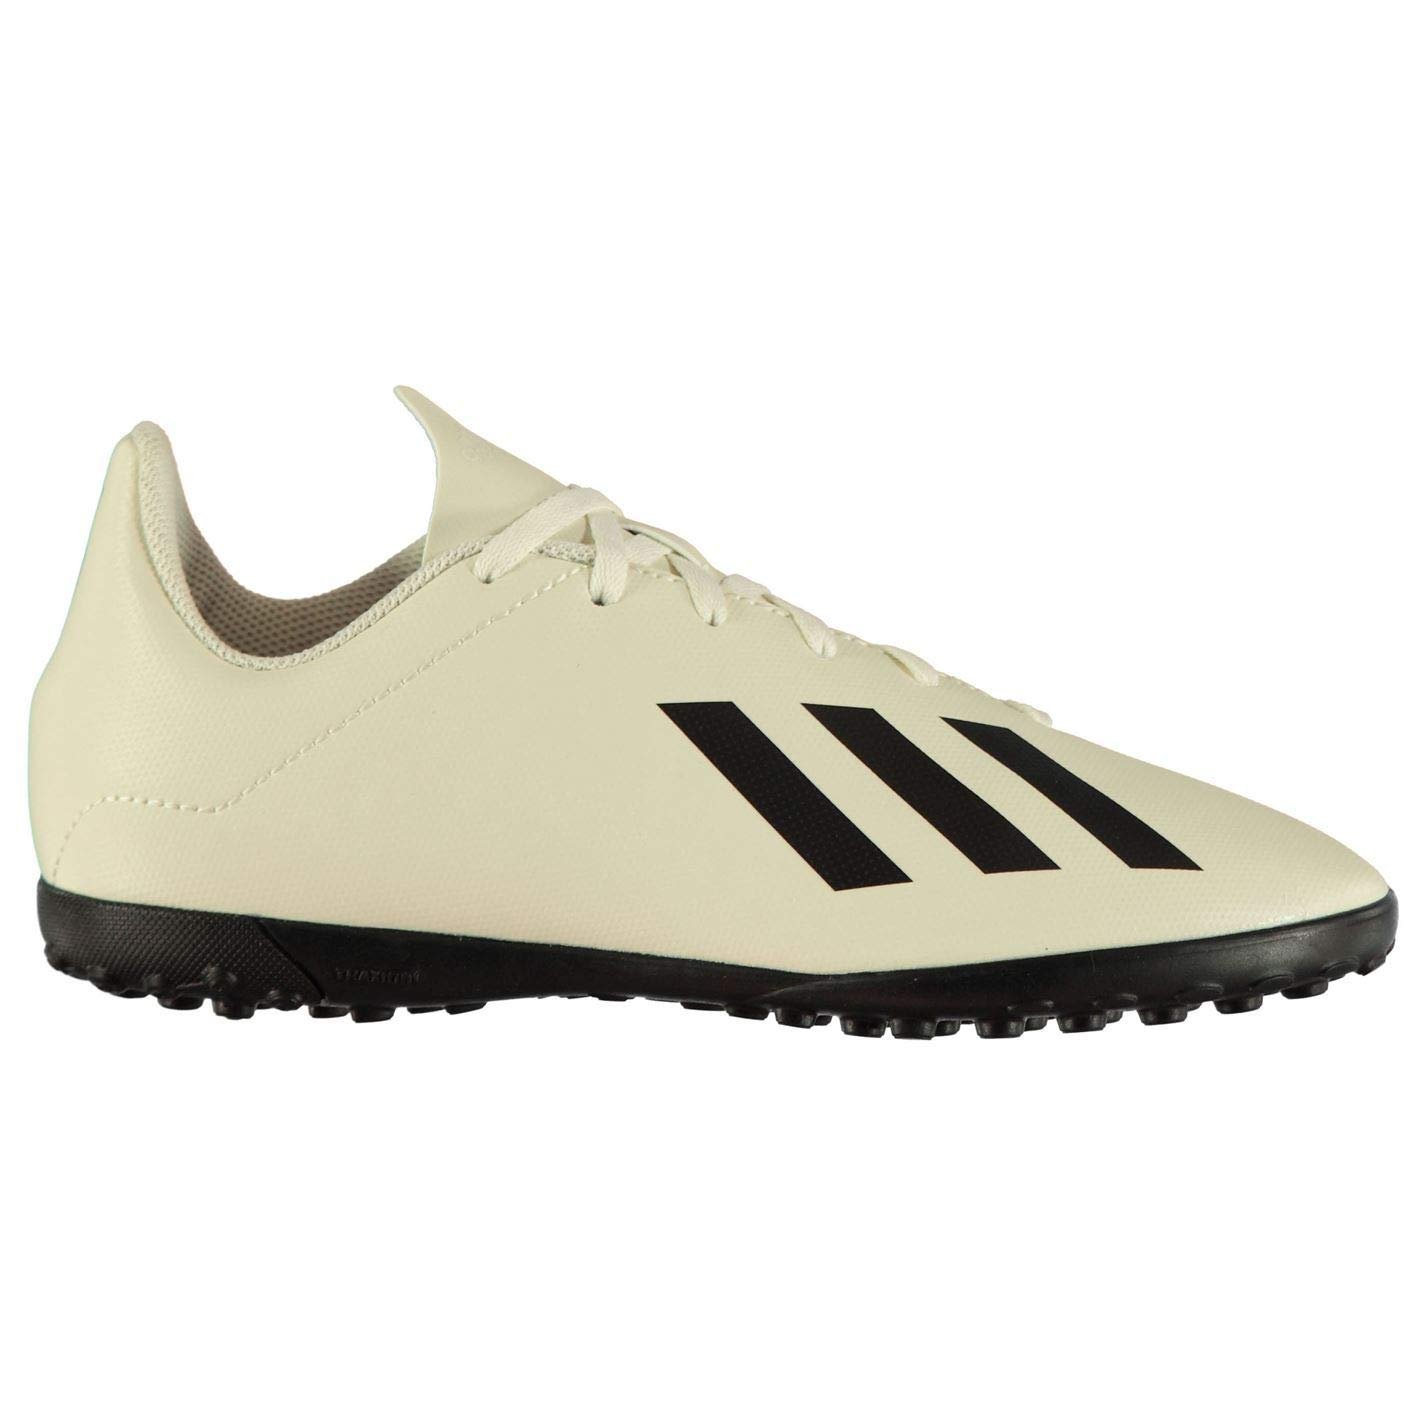 de Chaussures , Official pour Football EU 32 Blanc garçon